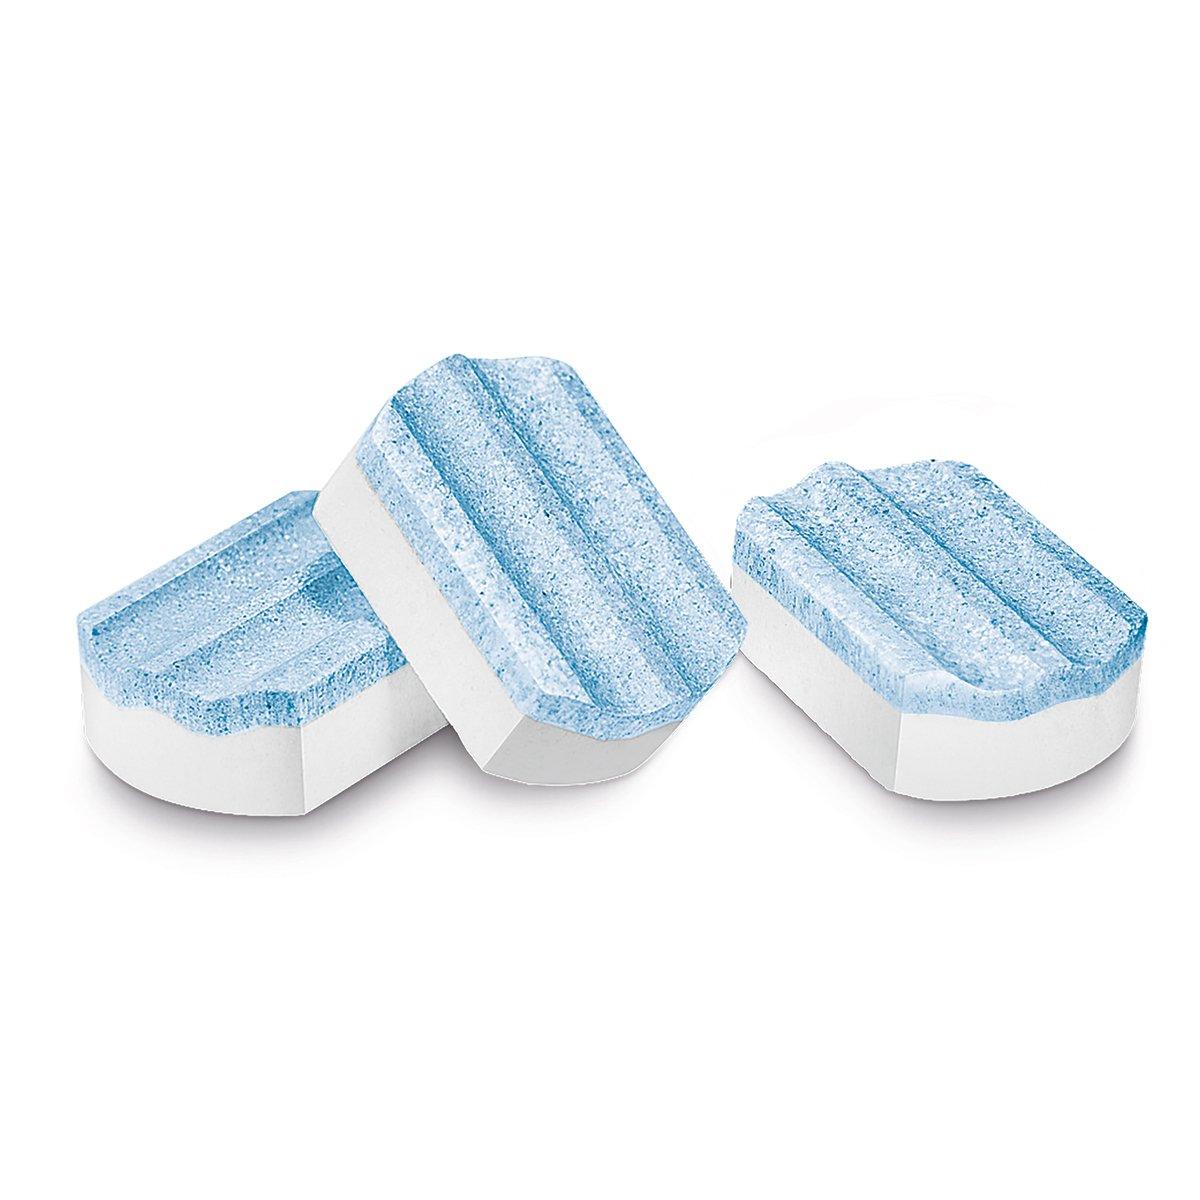 Bosch tcz8002 N pastillas descalcificadoras para cafeteras ...